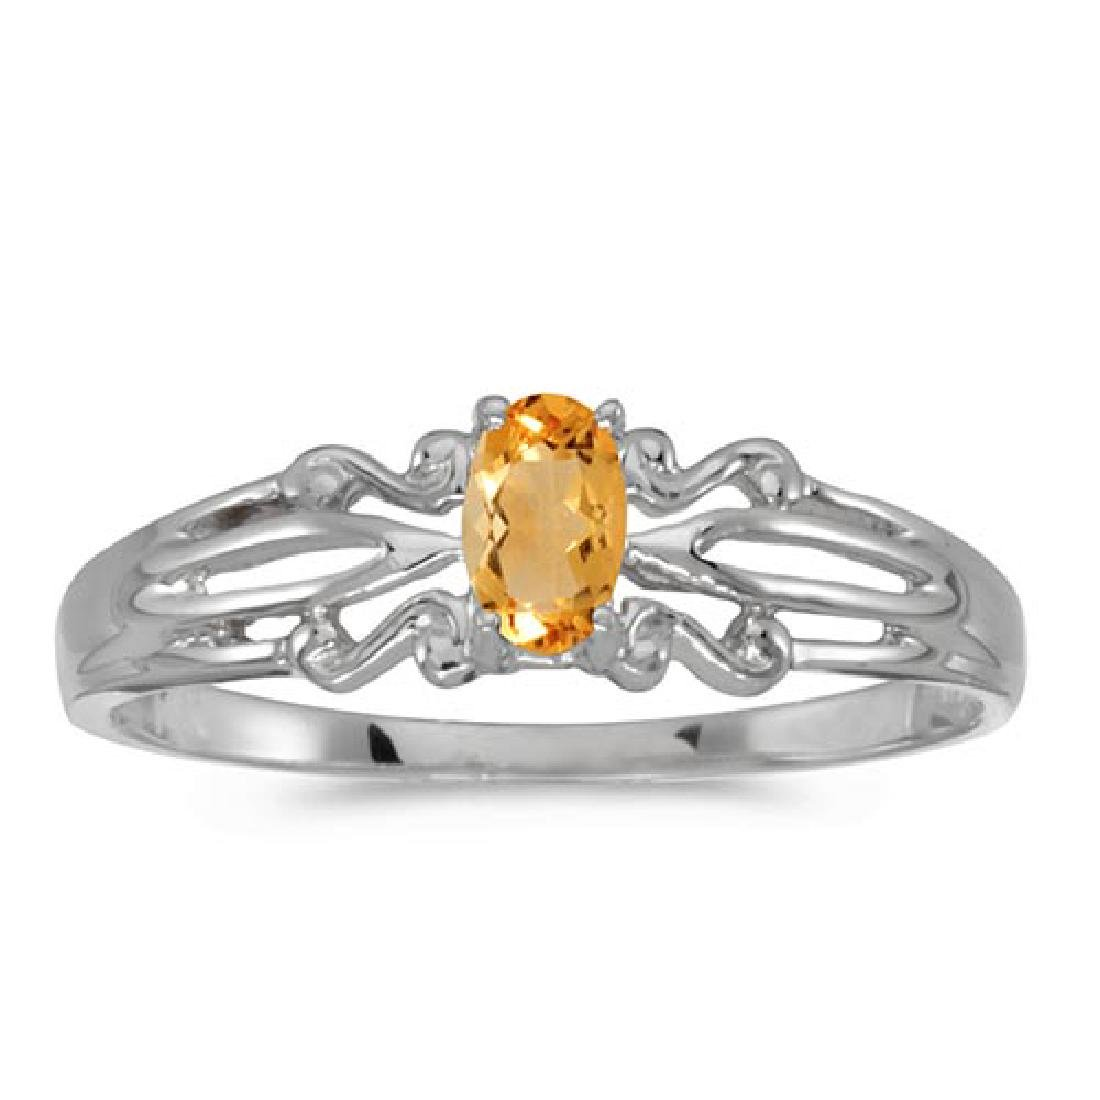 Certified 14k White Gold Oval Citrine Ring